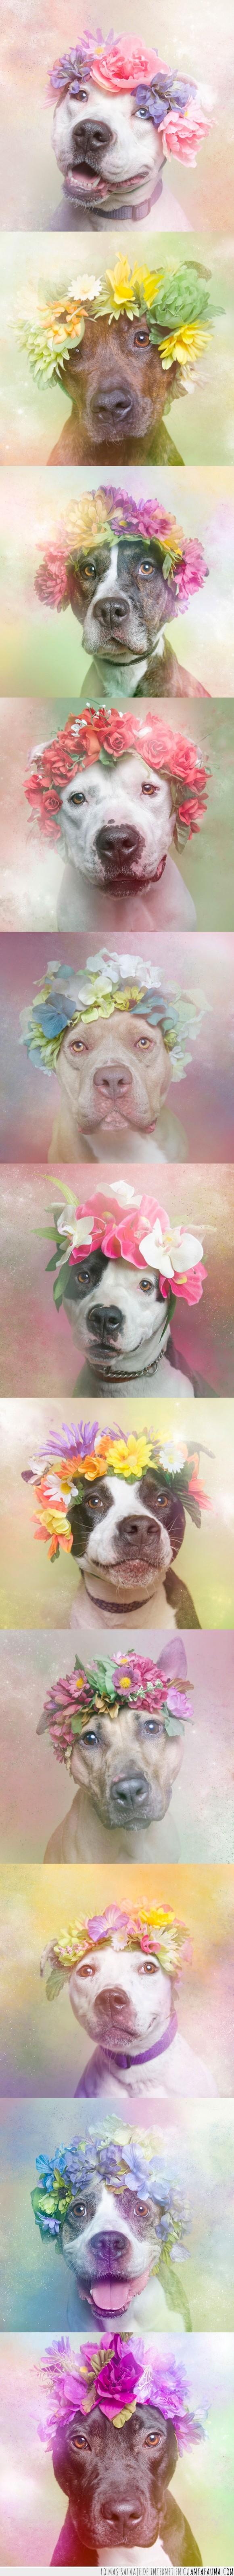 adopcion,adoptar,corona,diadema,dulce,flores,perro,pitbull